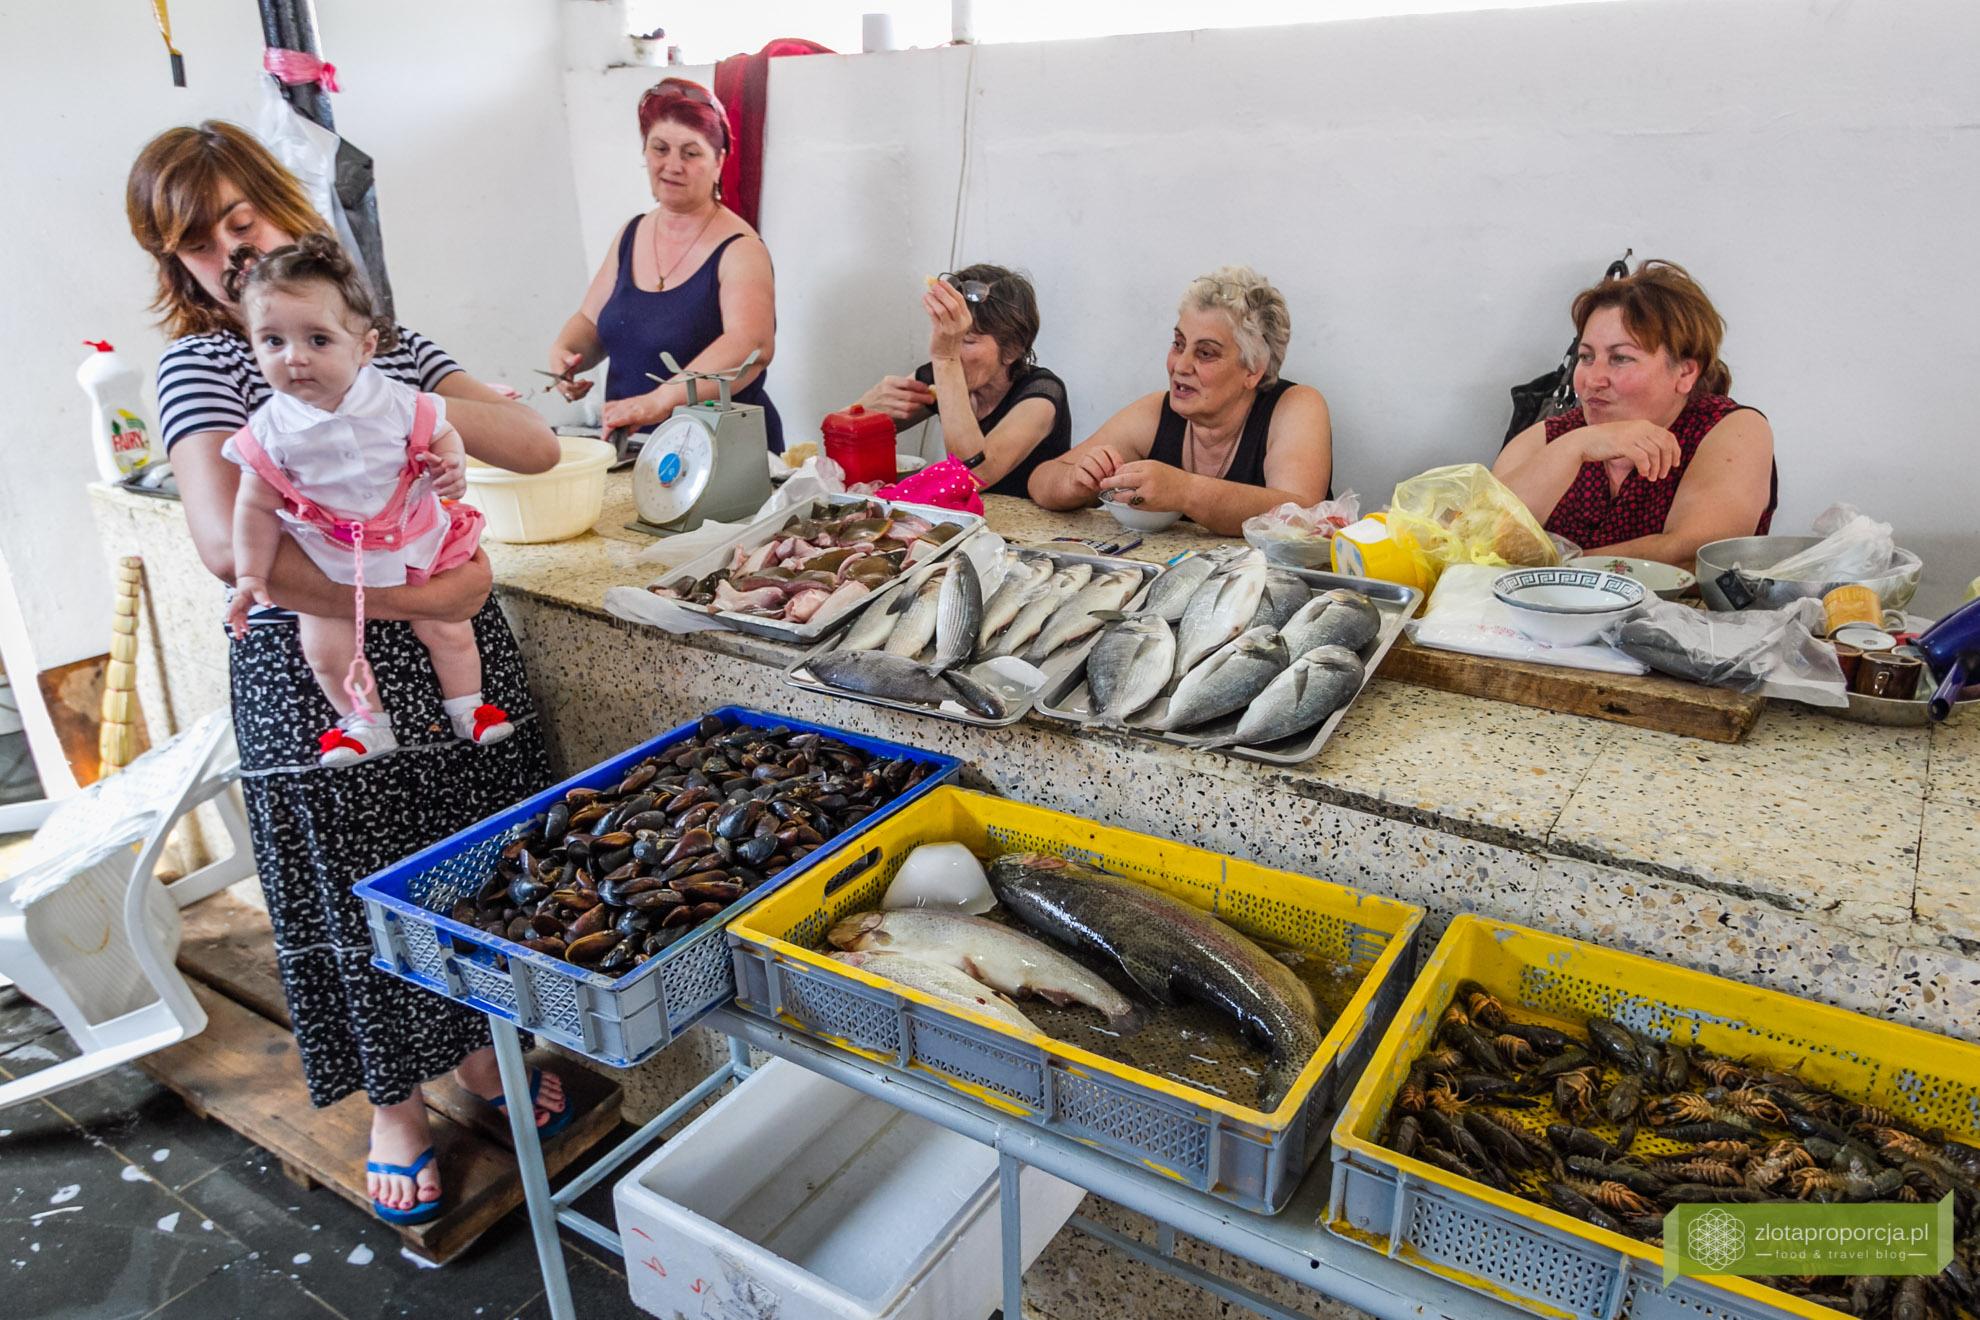 Batumi, Gruzja, Adżaria, atrakcje Batumi, co zobaczyć w Batumi, atrakcje Gruzji; targ rybny w Batumi